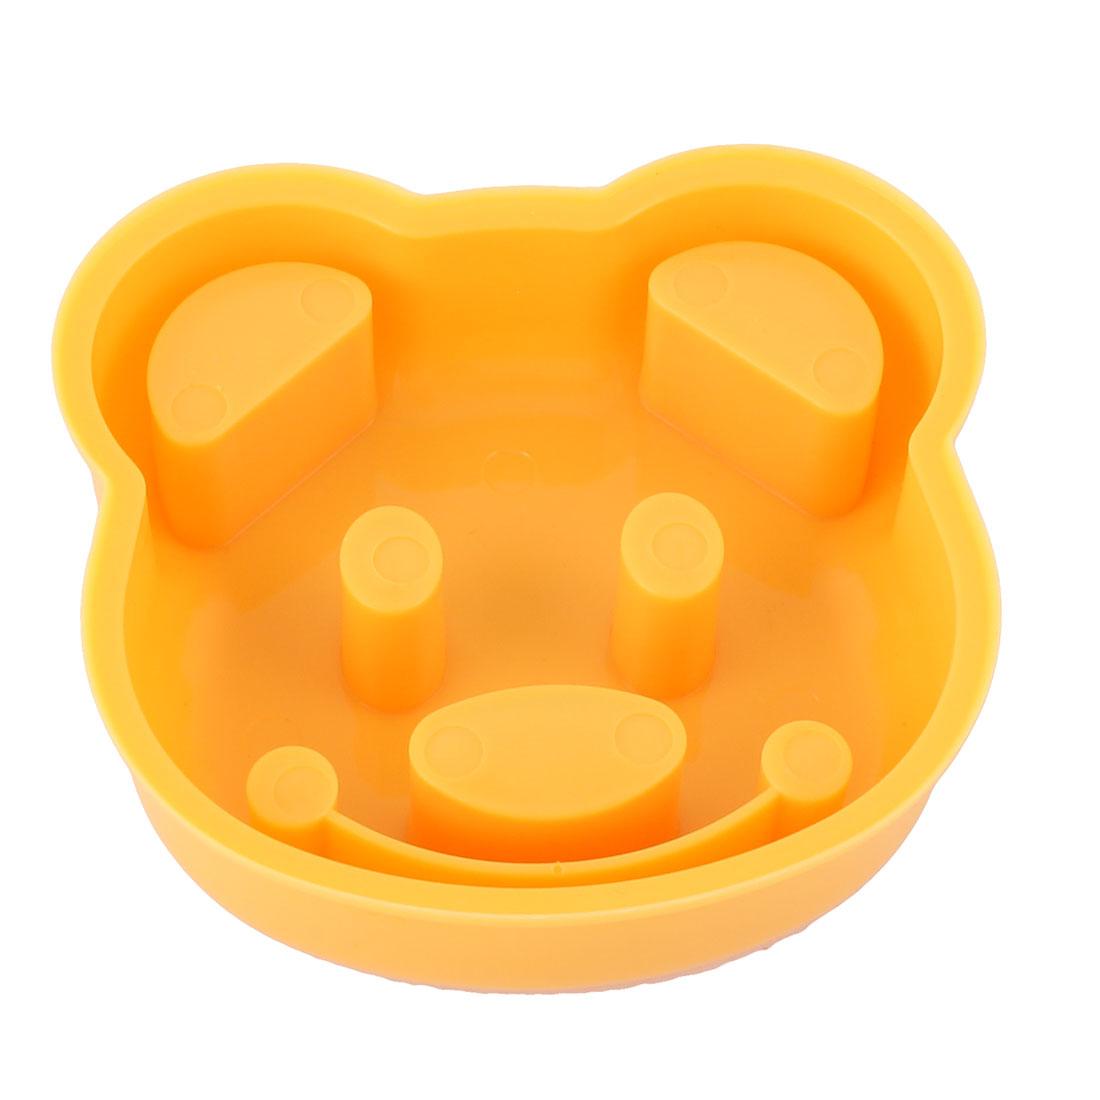 Home Kitchen Plastic Bear Head Shaped DIY Sandwich Bread Rice Ball Mould Orange - image 1 of 3